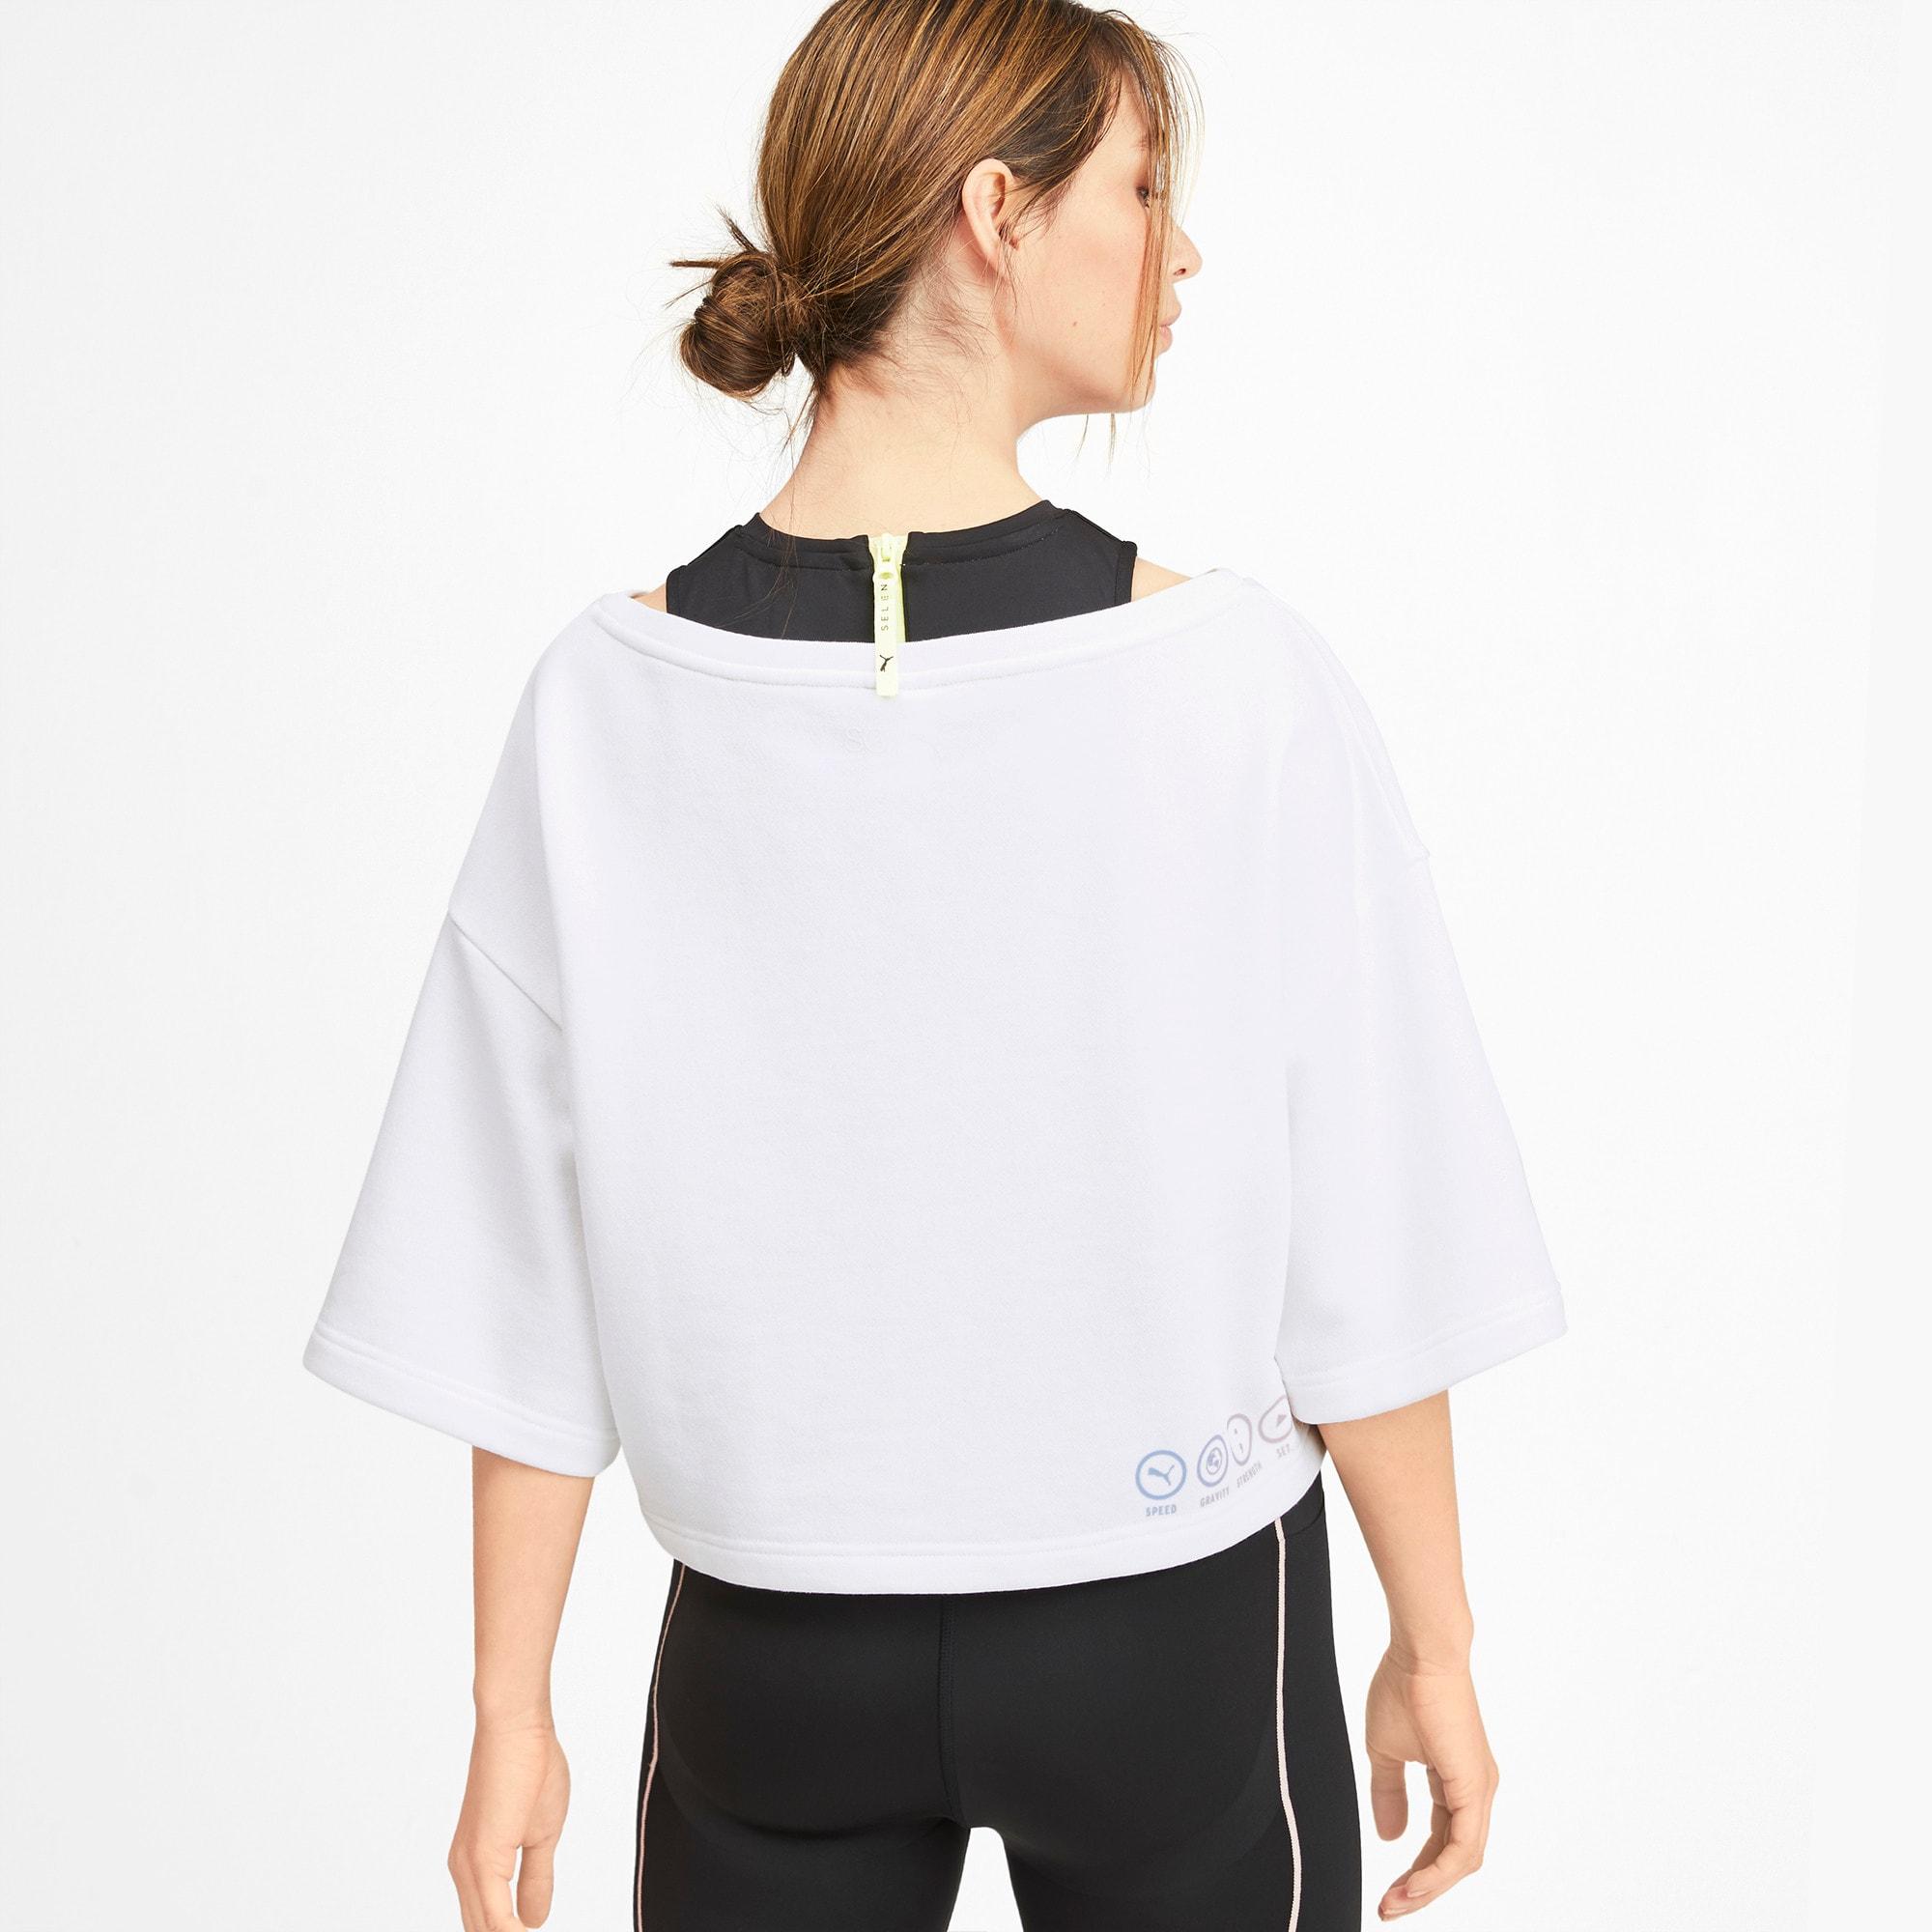 Thumbnail 2 of PUMA x SELENA GOMEZ Cropped Short Sleeve Women's Sweater, Puma White, medium